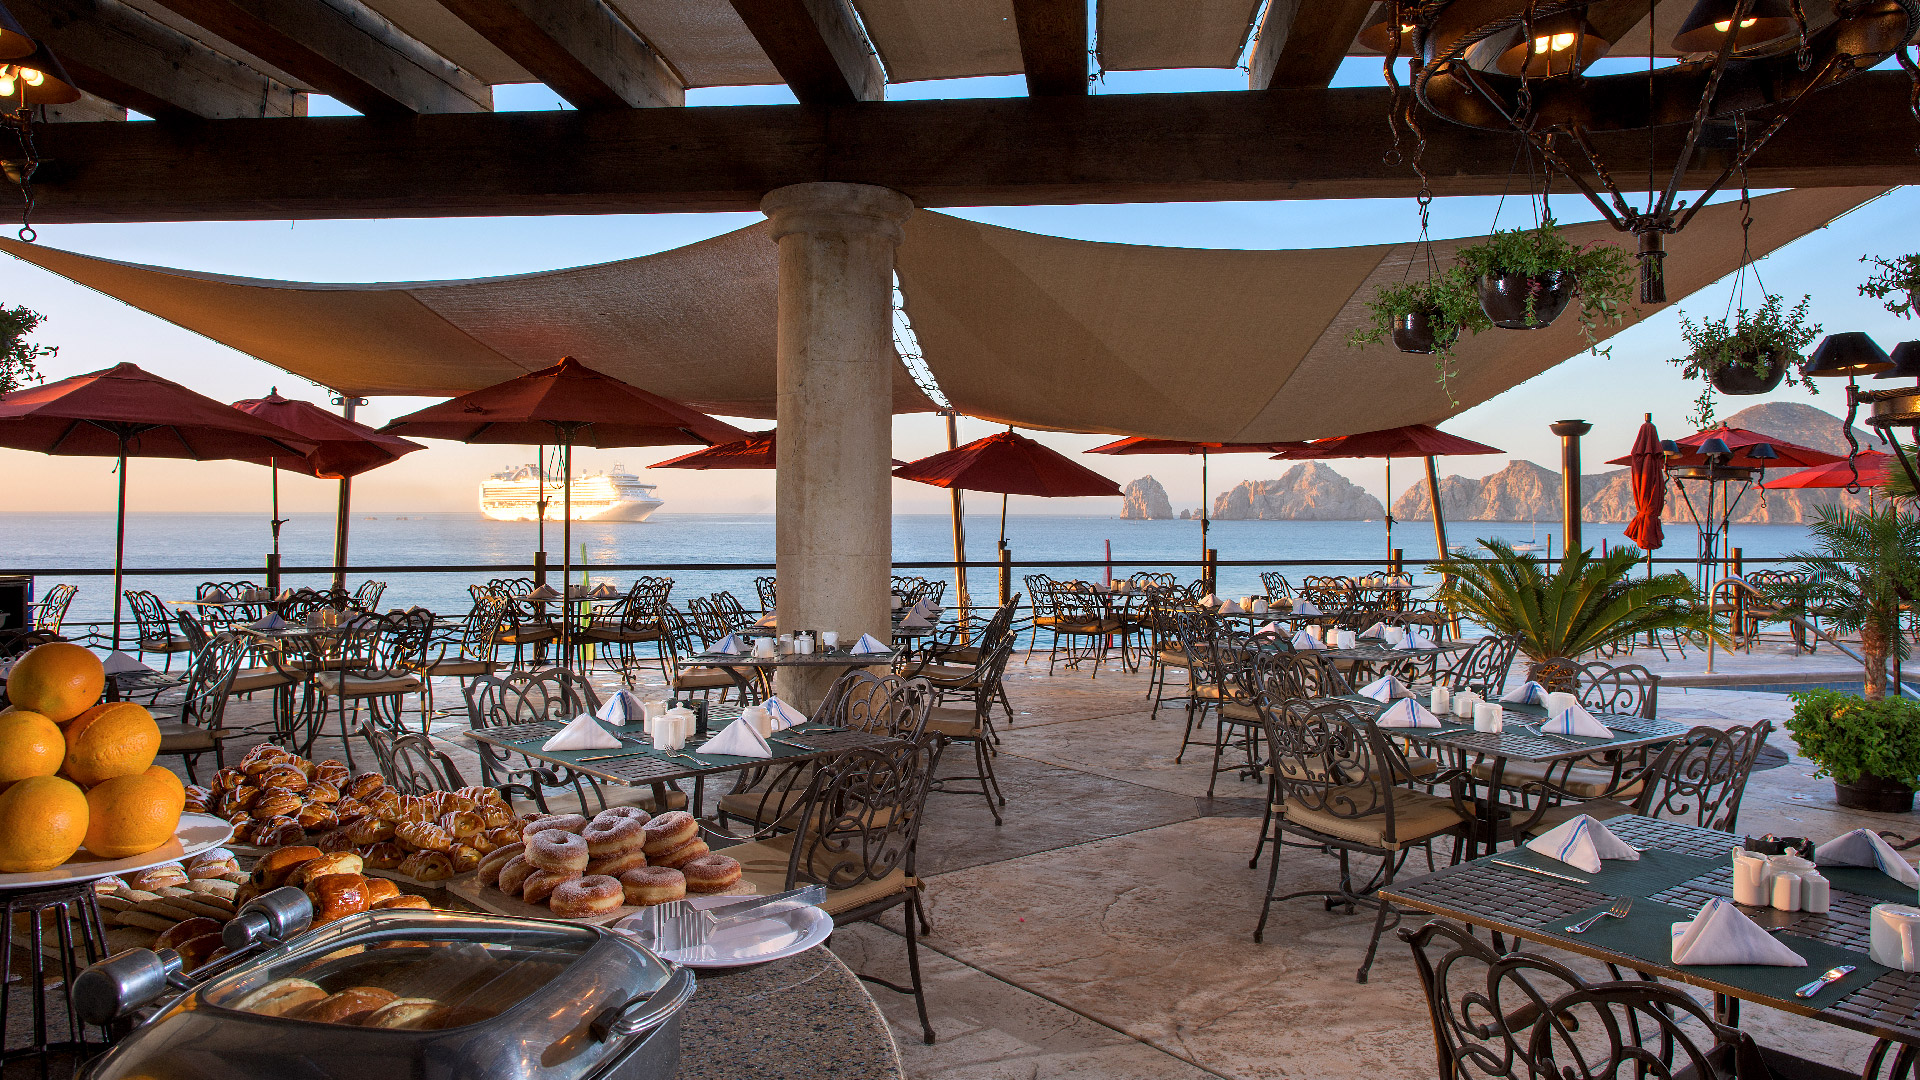 Villa del palmar cabo san lucas bella california restaurant 4  1